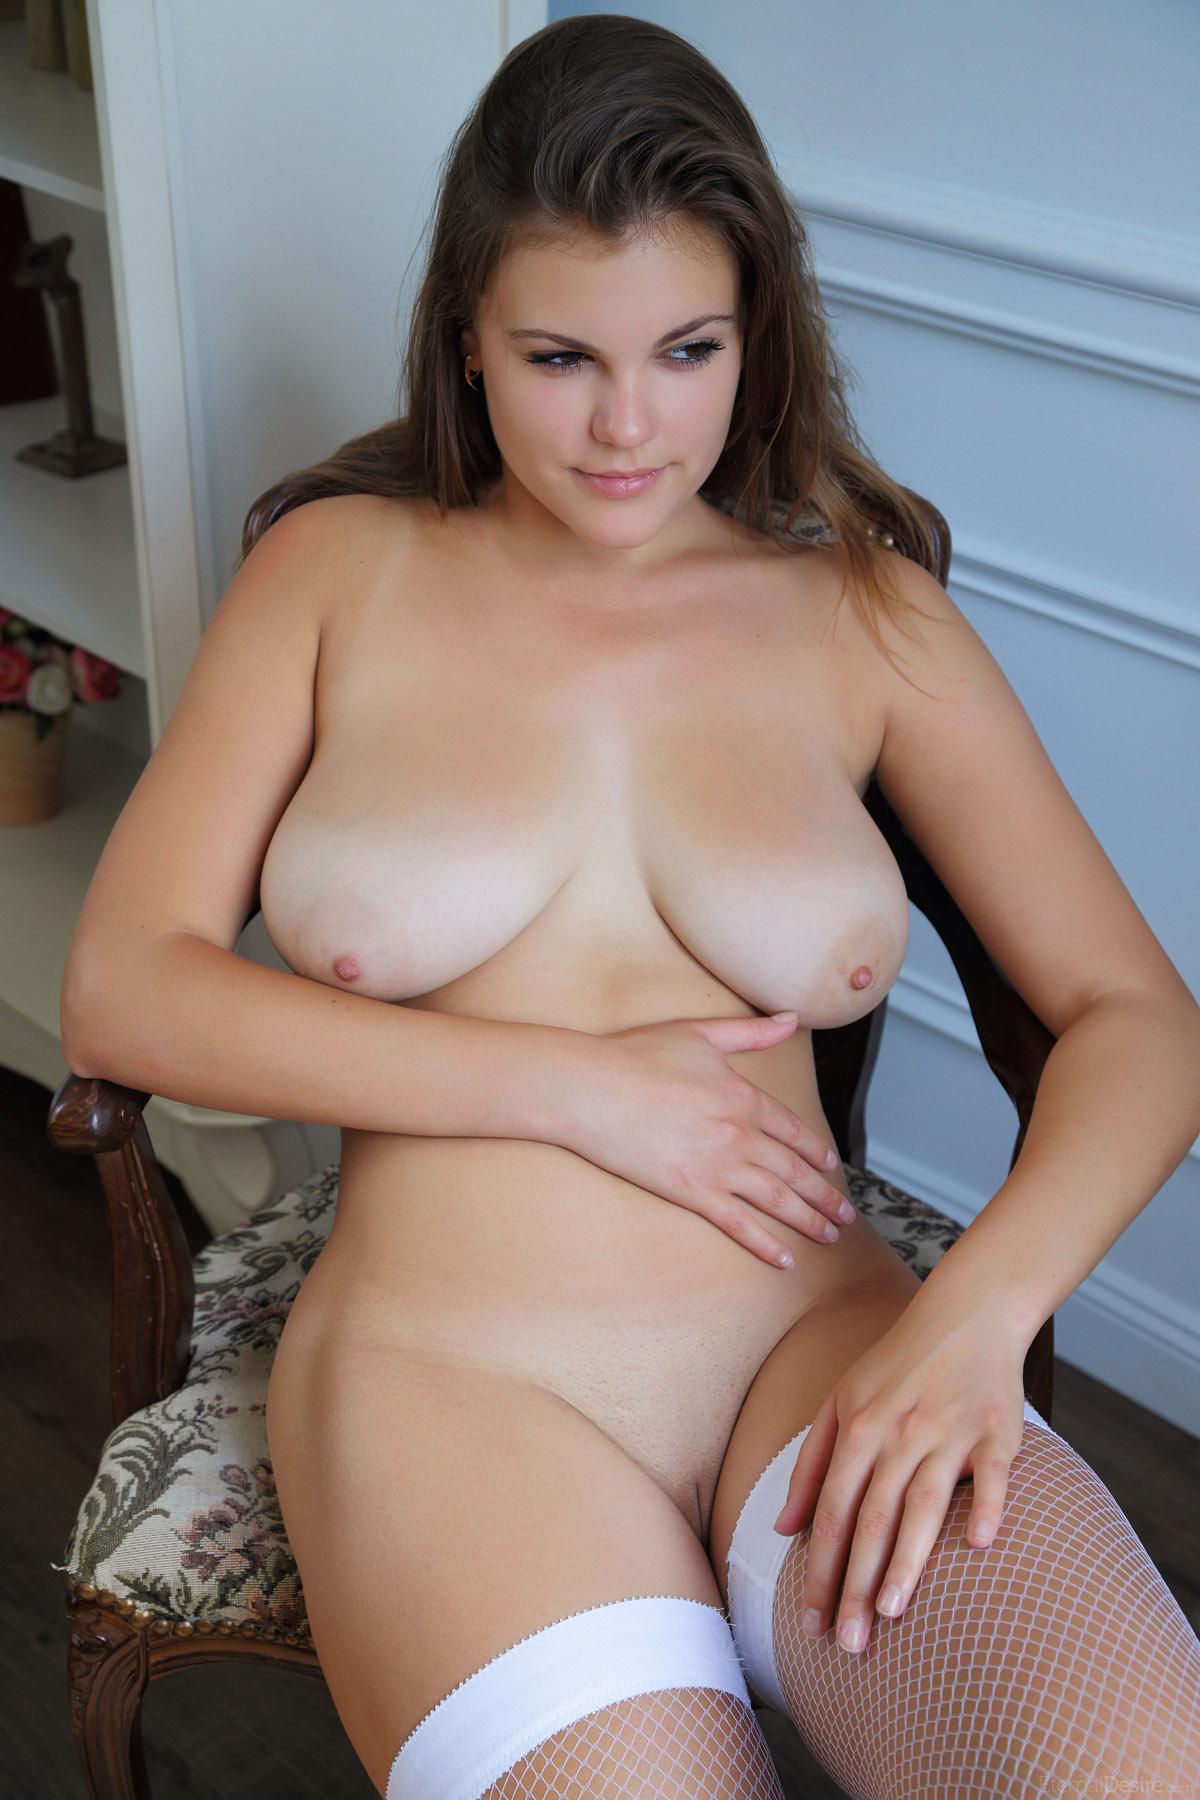 Lily allen boobs tshirt